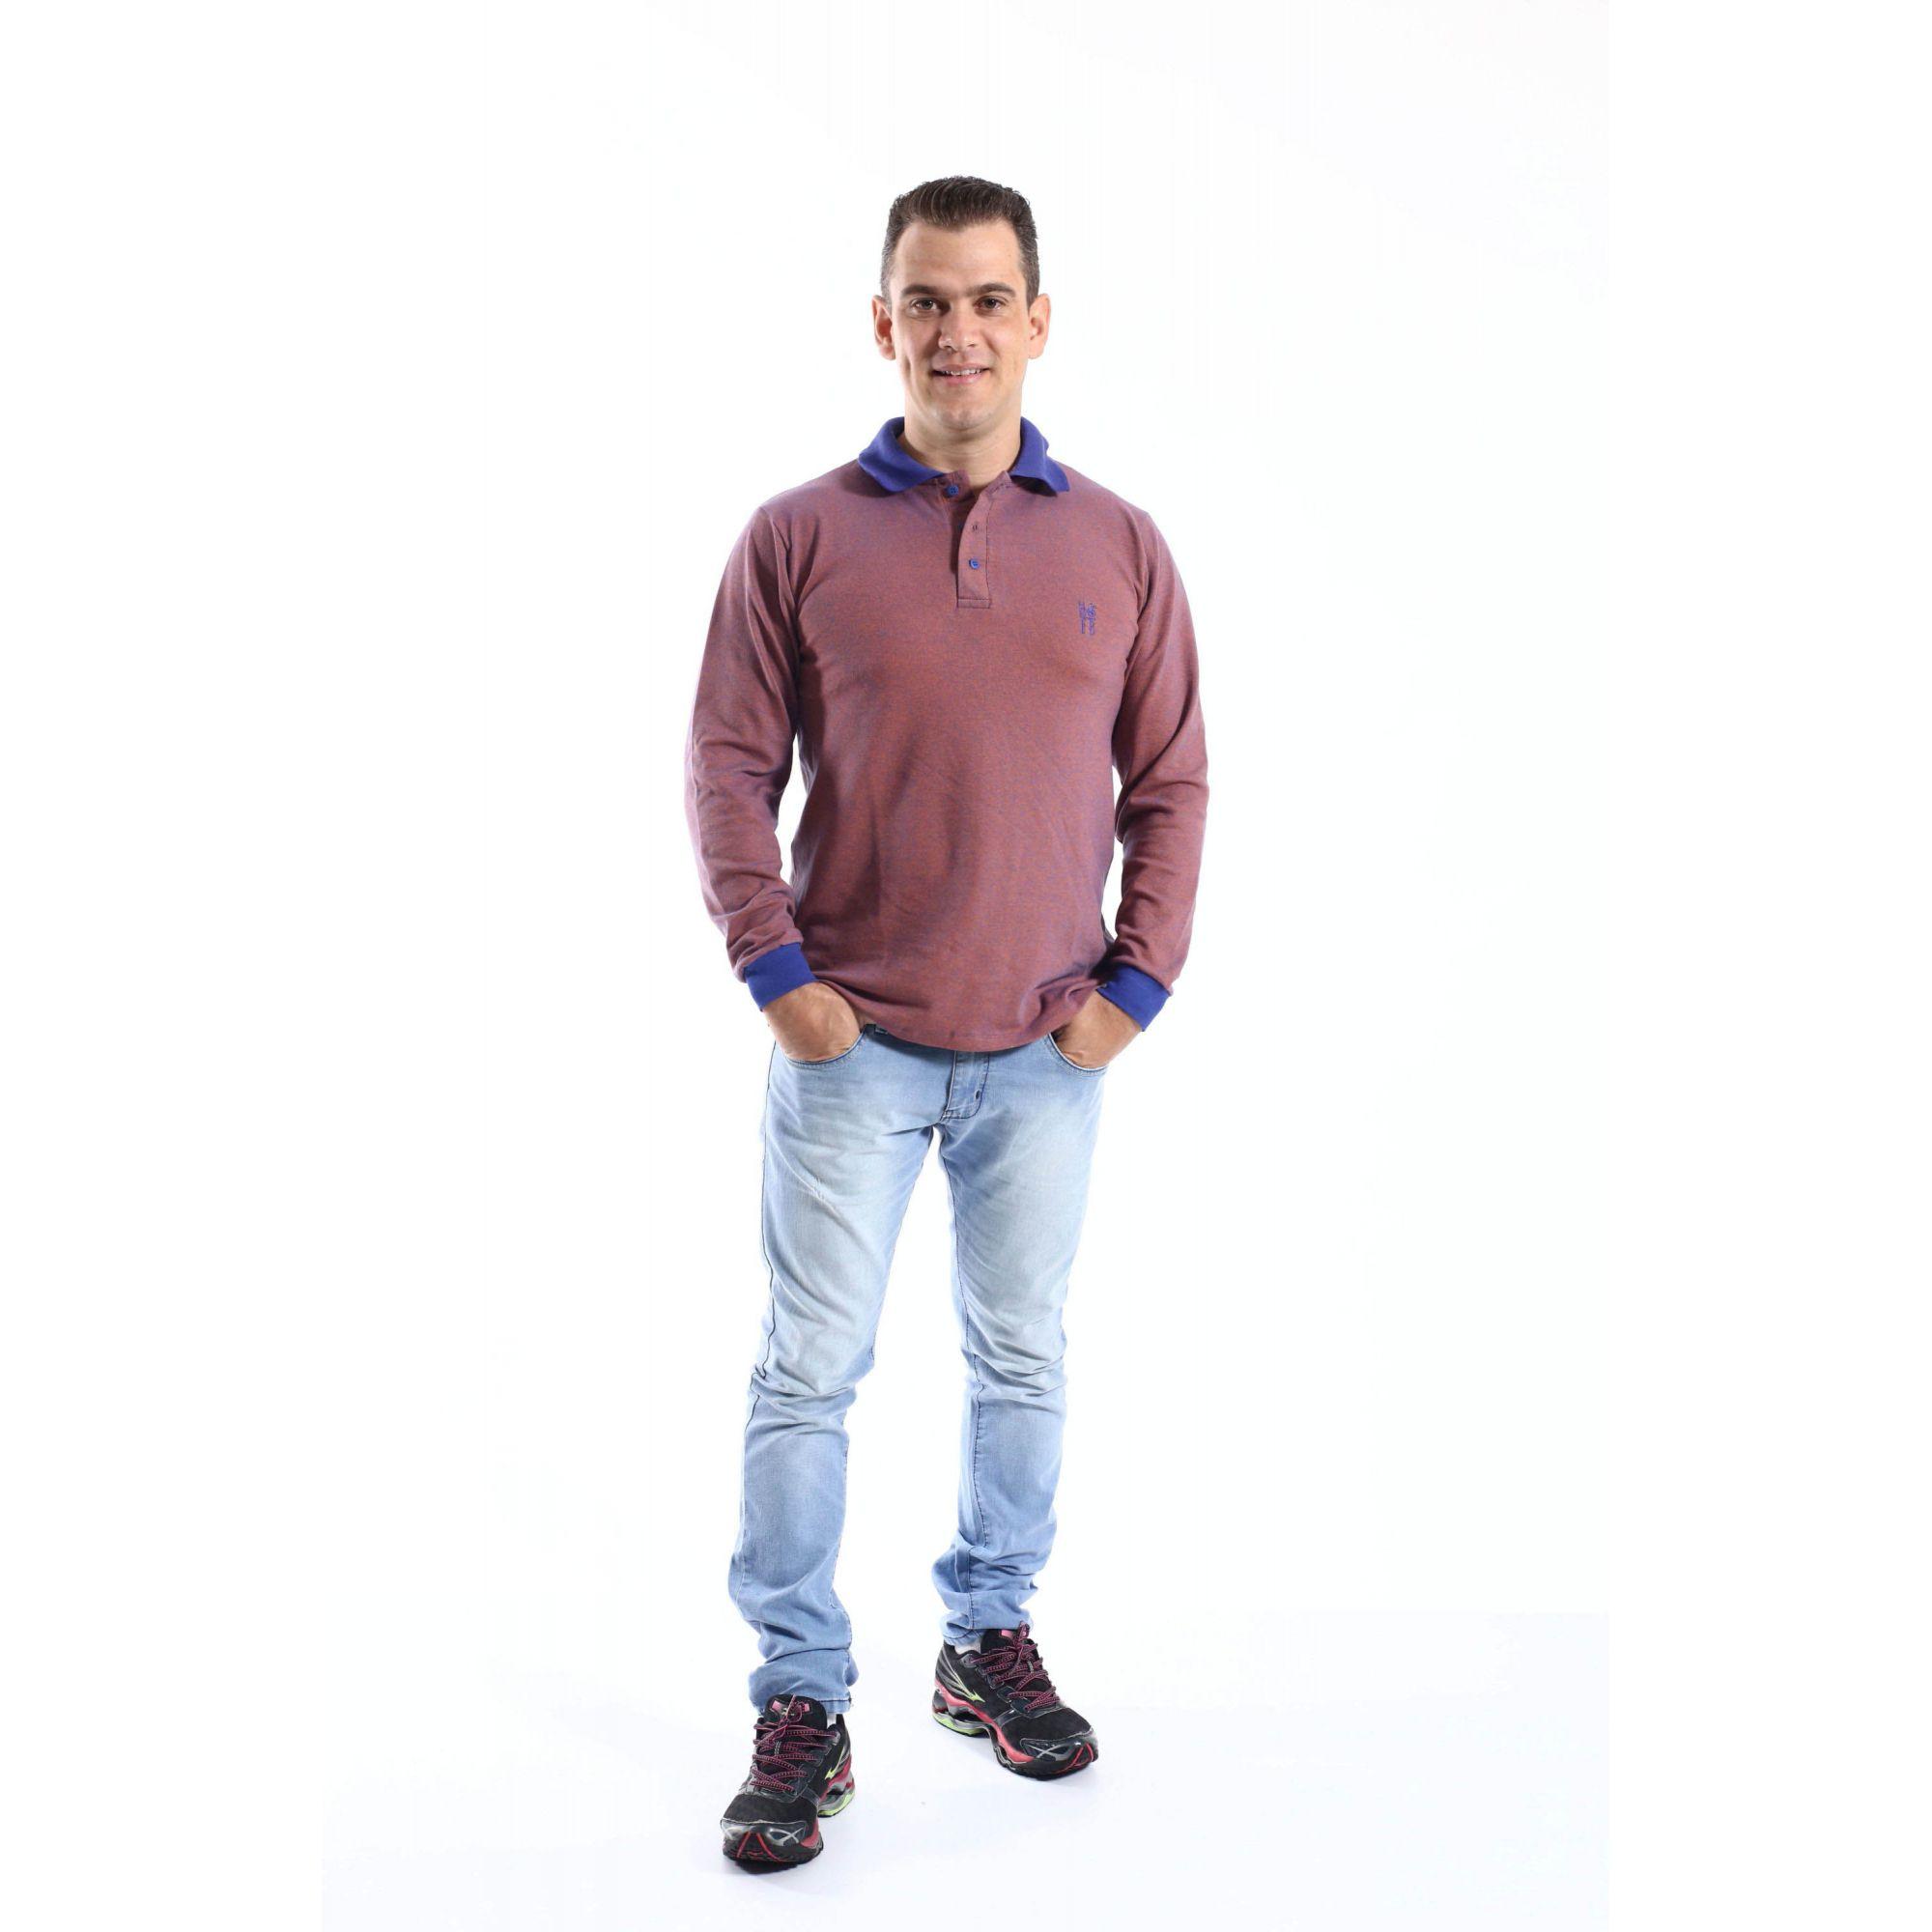 PAI E FILHO > Kit 02 Camisas Polos laranjas Manga Longa [Coleção Tal Pai Tal Filho]  - Heitor Fashion Brazil